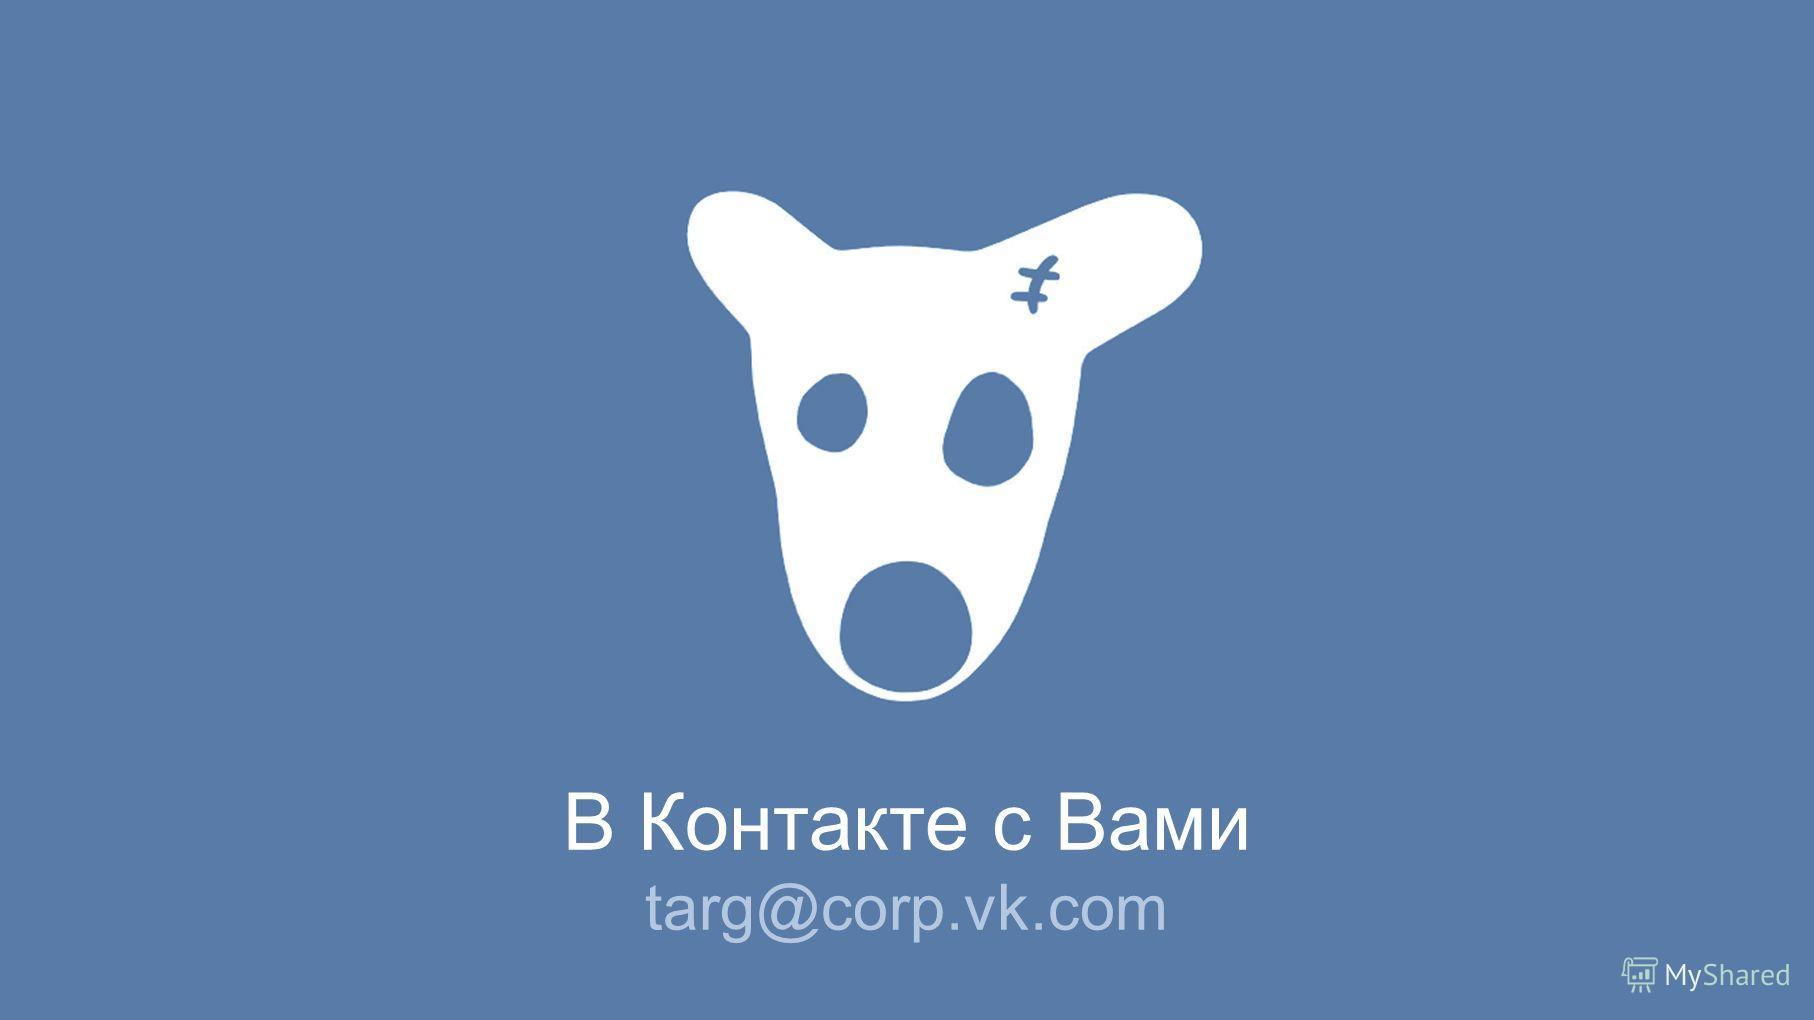 В Контакте с Вами targ@corp.vk.com